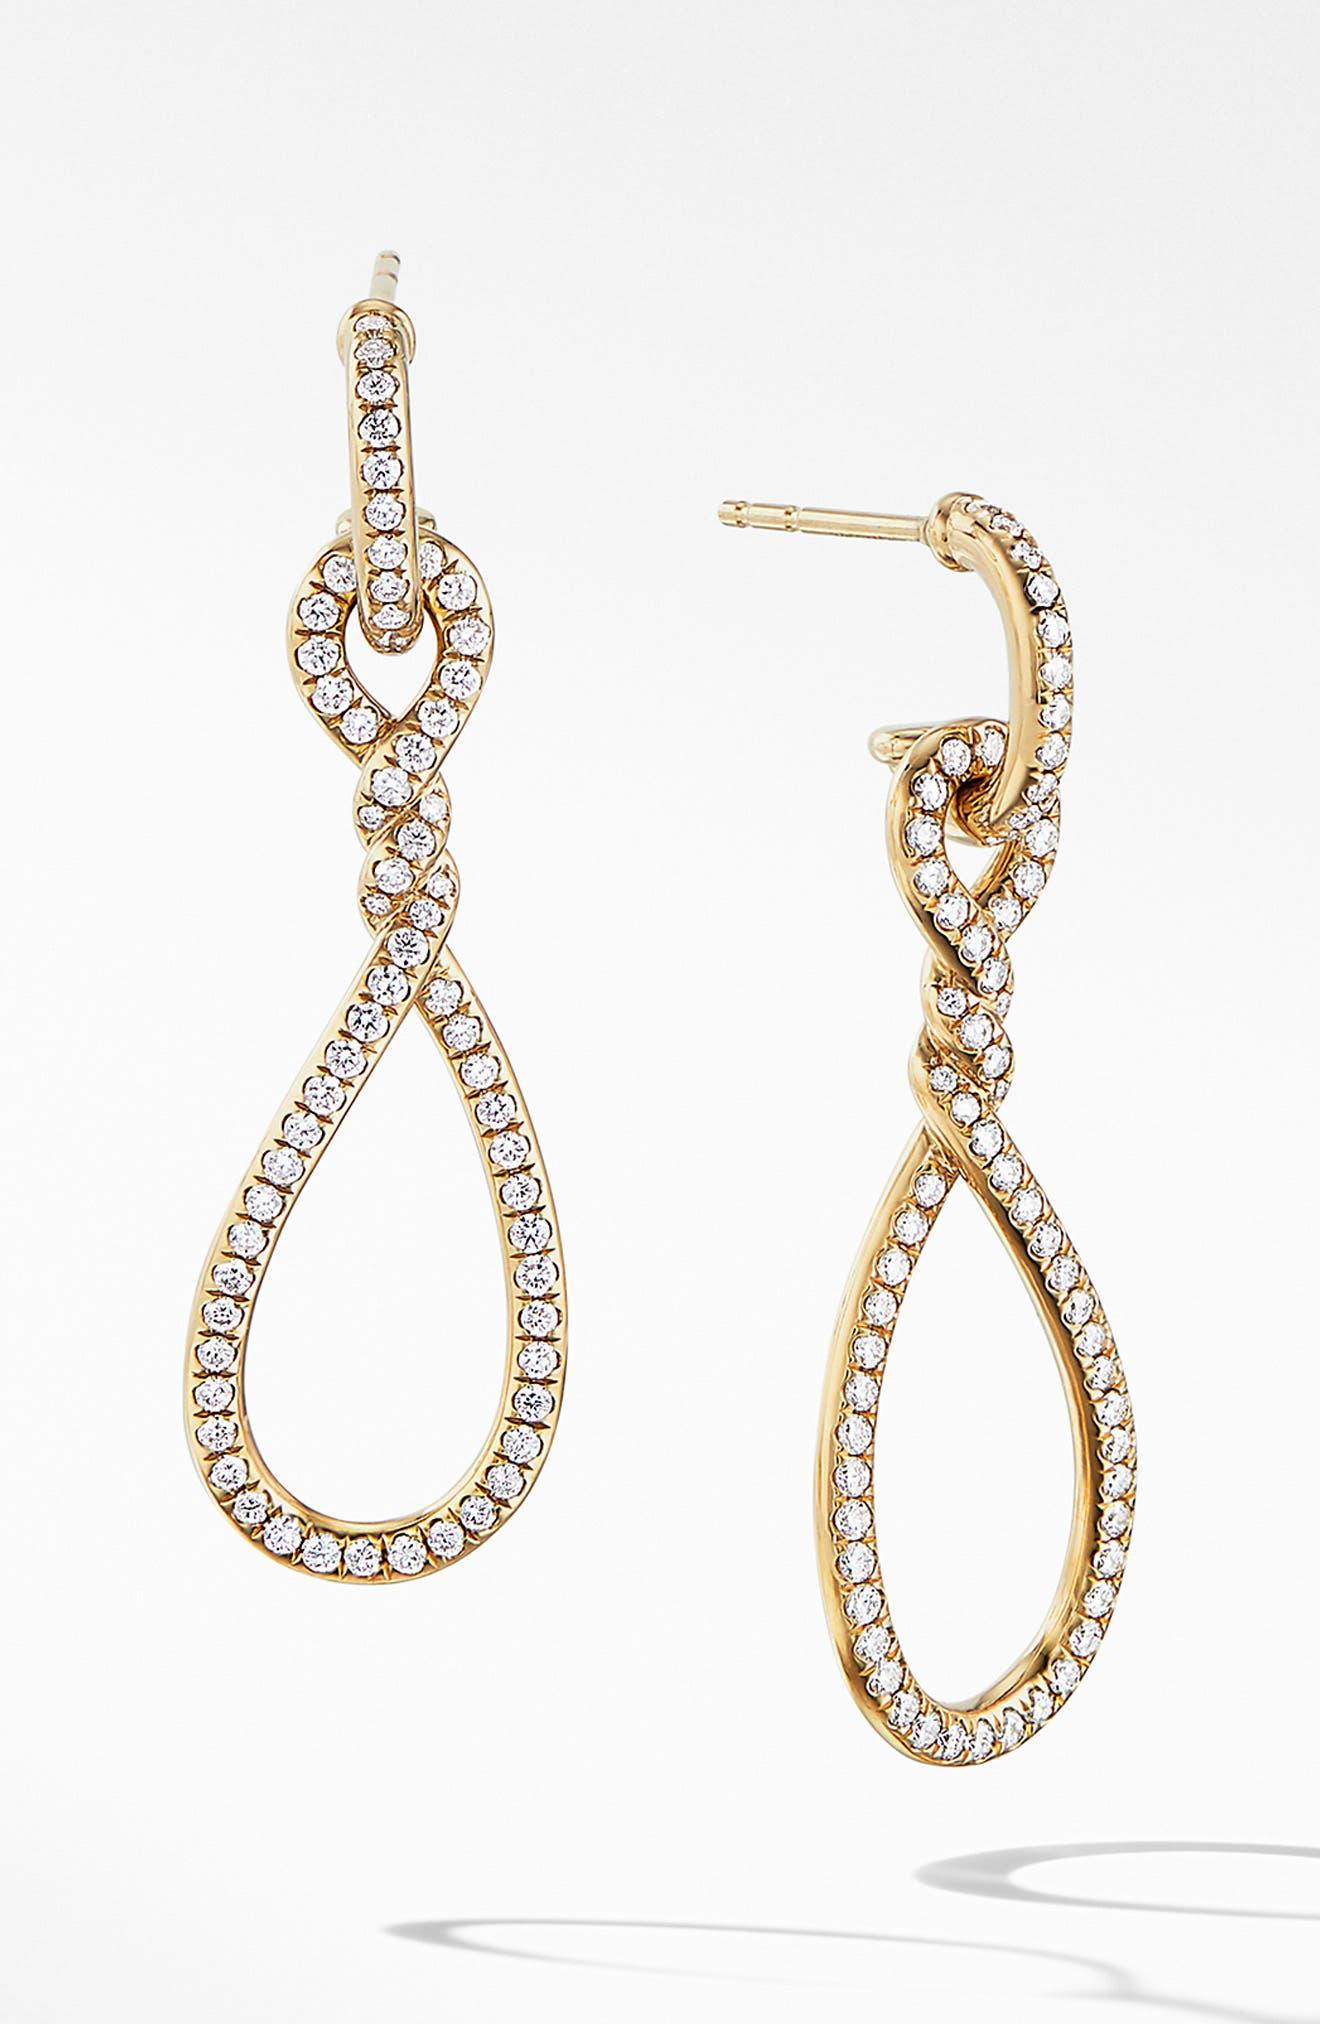 DAVID YURMAN Continuance Full Pavé Small Drop Earrings in 18K Yellow Gold, Main, color, YELLOW GOLD/ DIAMOND